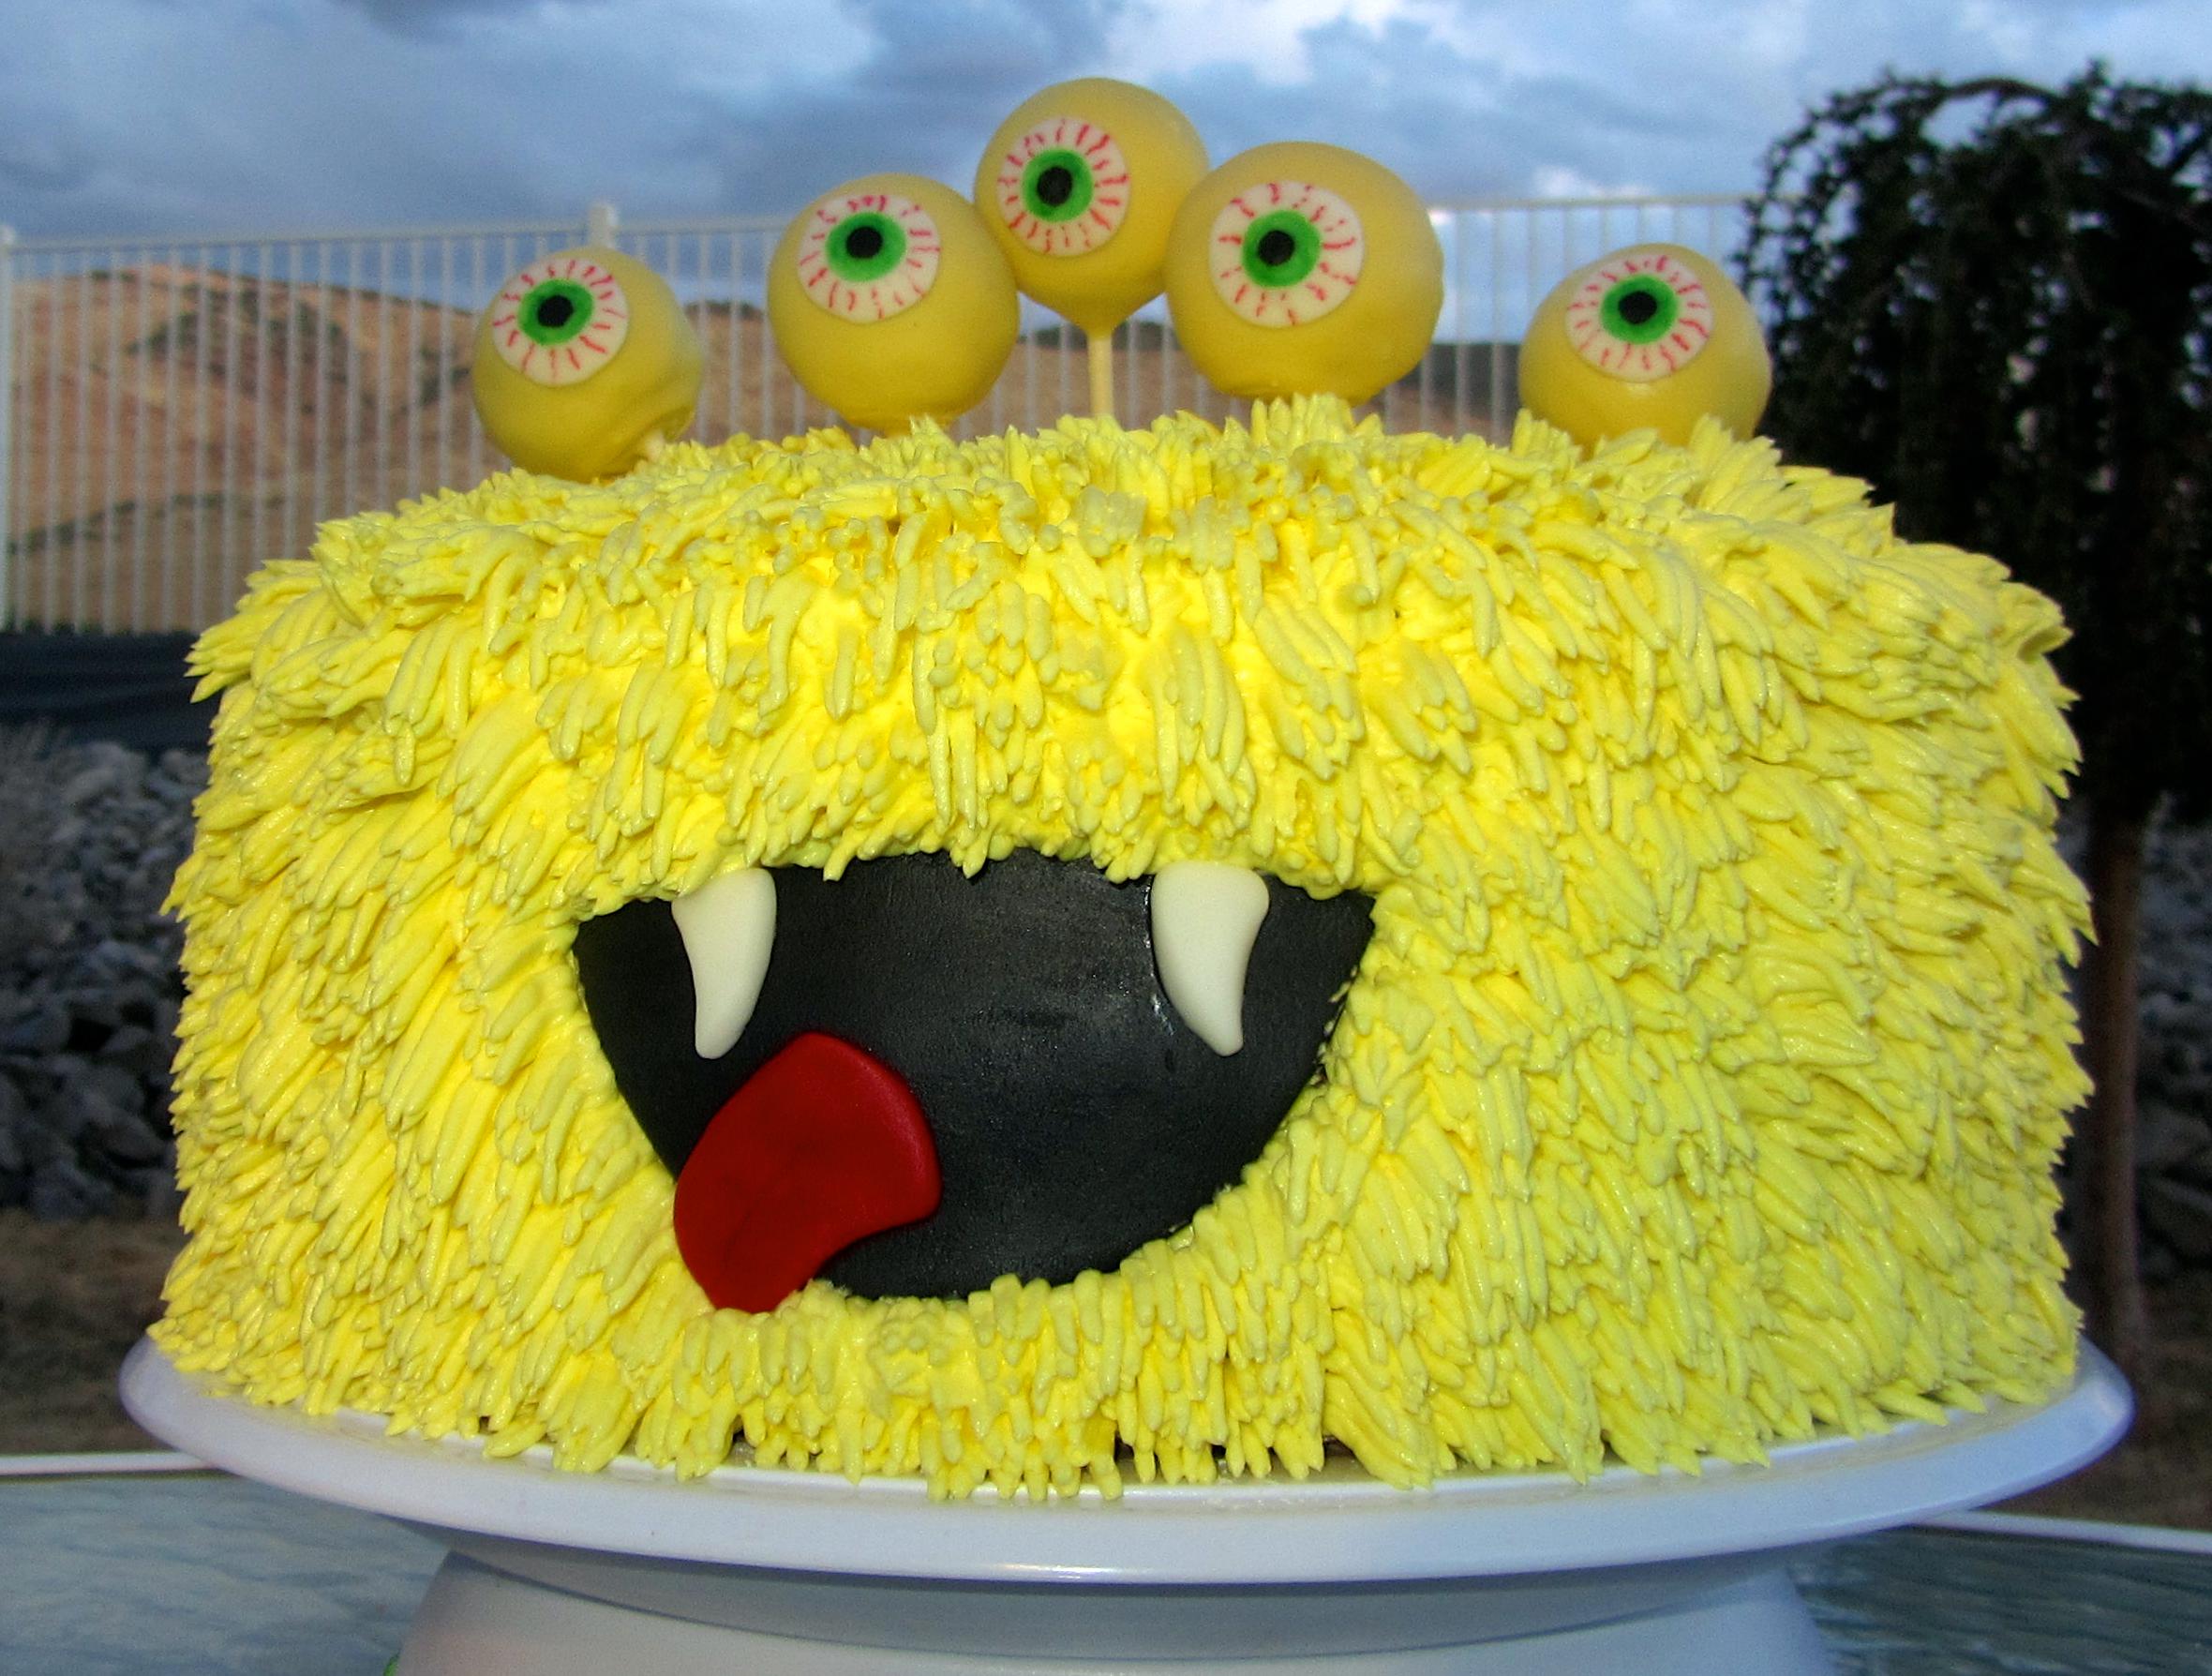 Awe Inspiring Monster Cake Artsyondemand Funny Birthday Cards Online Elaedamsfinfo